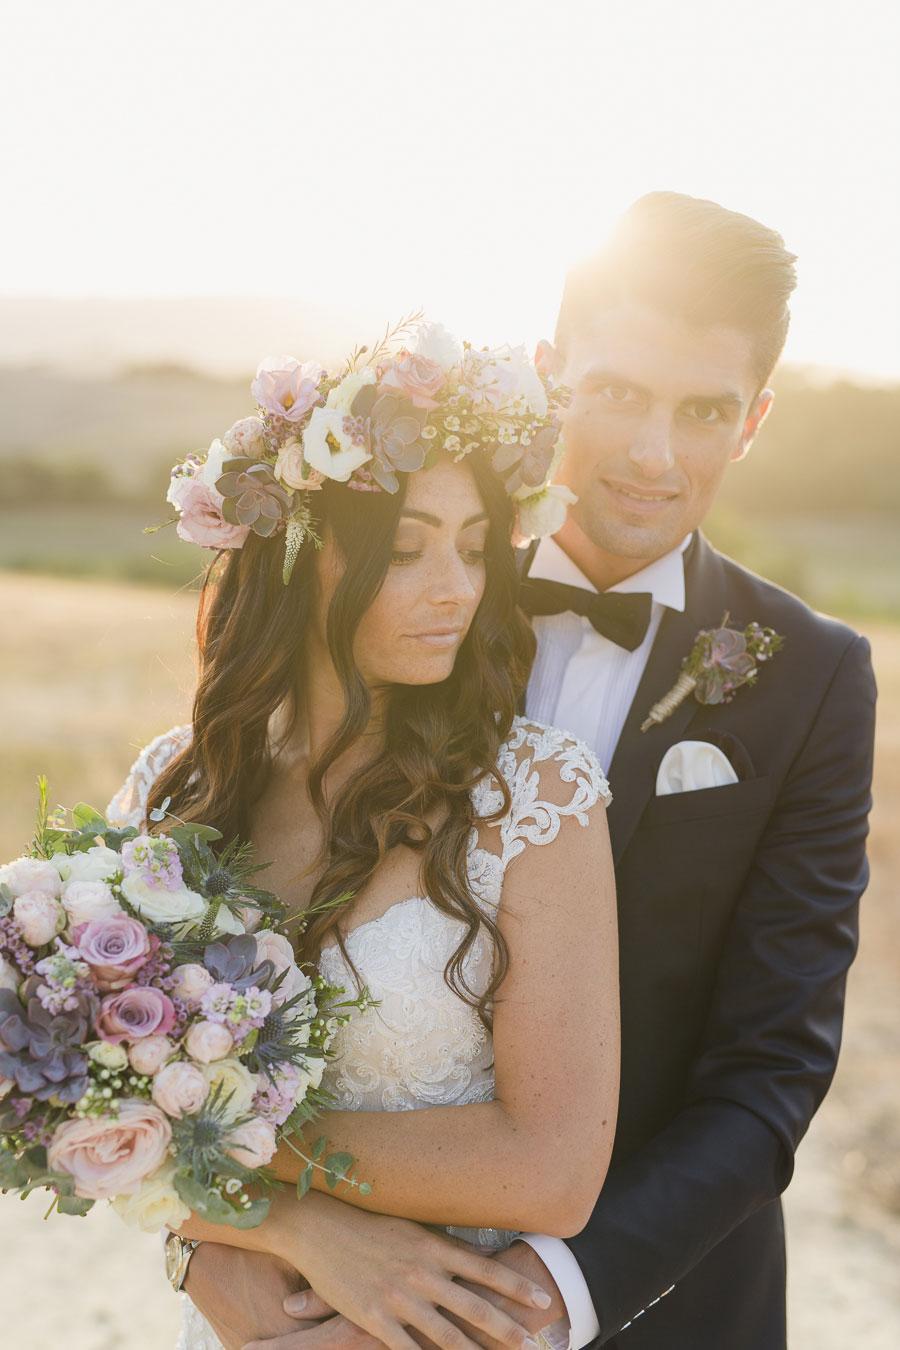 Wedding-Nicholad-and-Federica-Giuseppe-Giovannelli-205